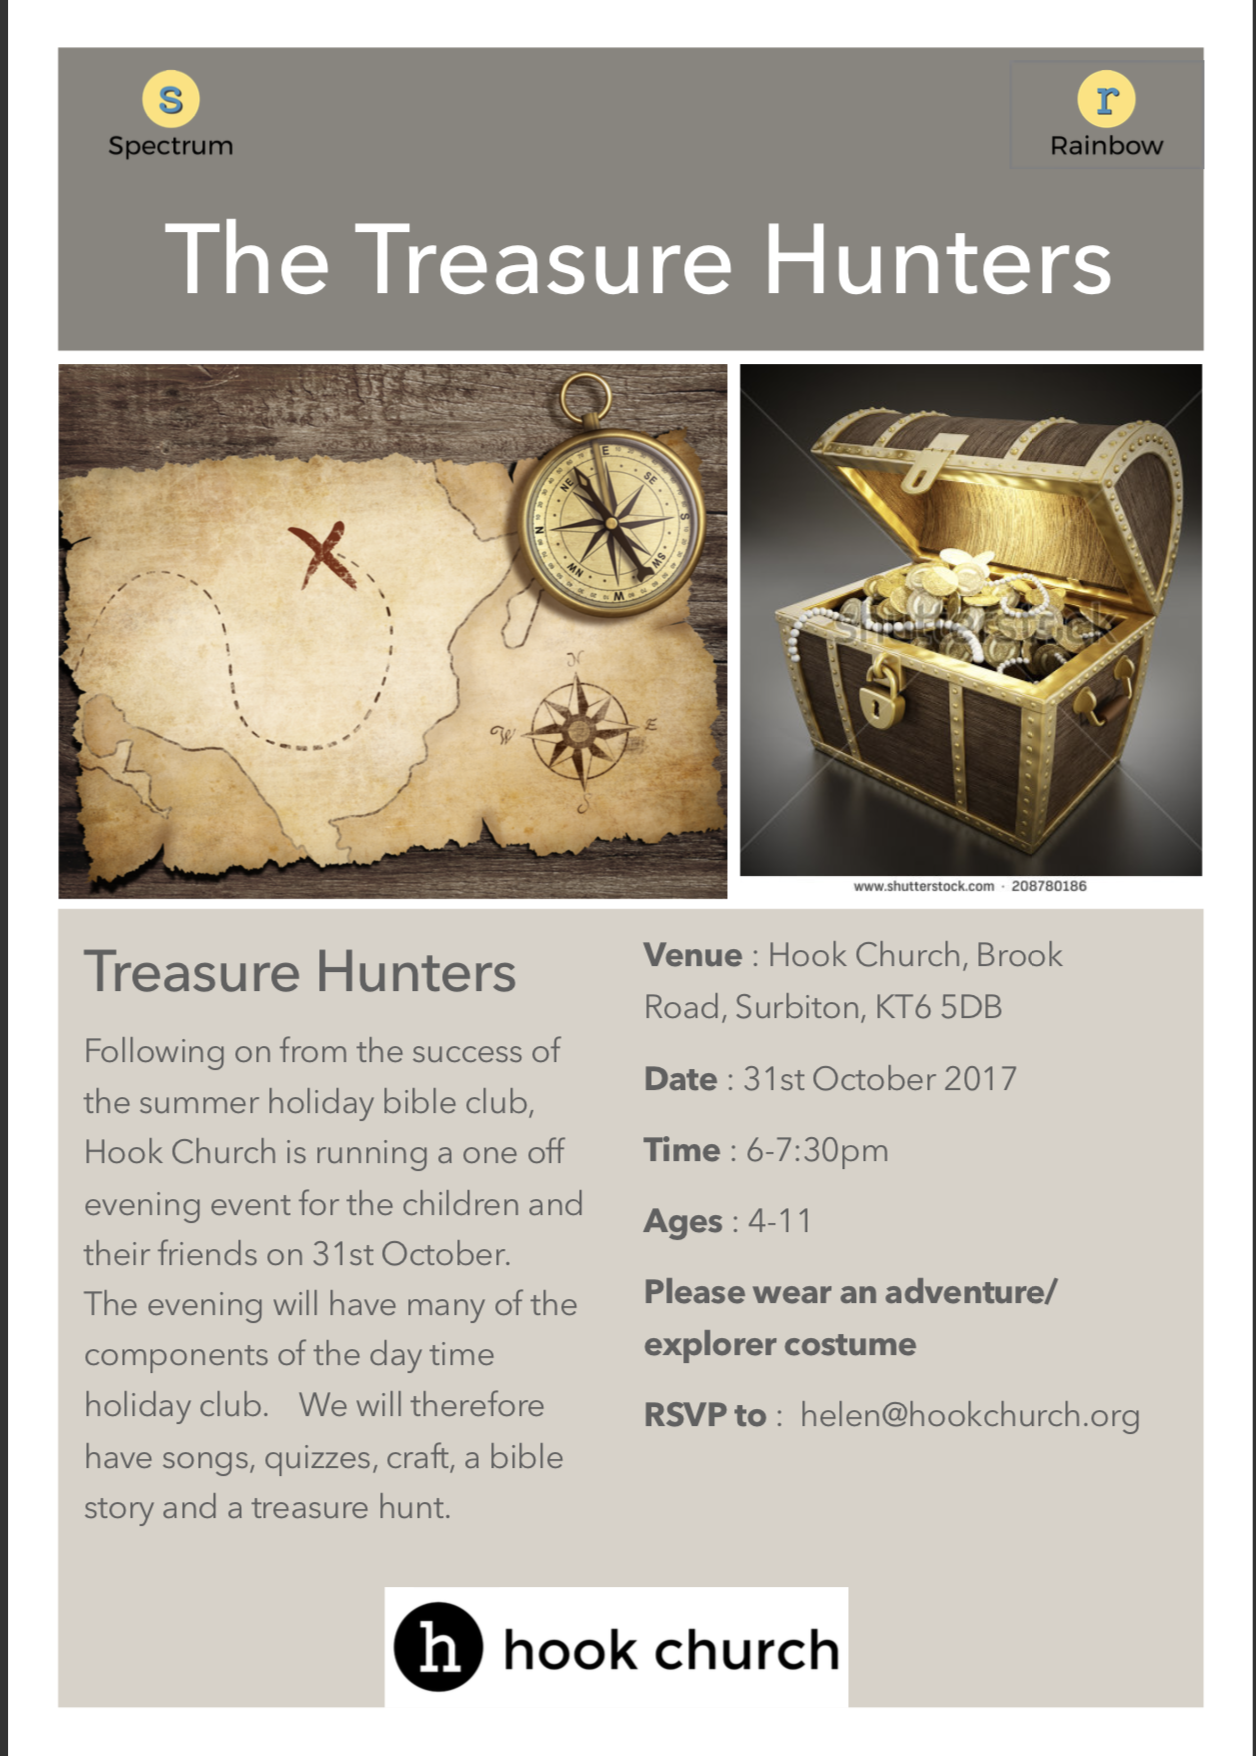 treasure hunters jpeg.png